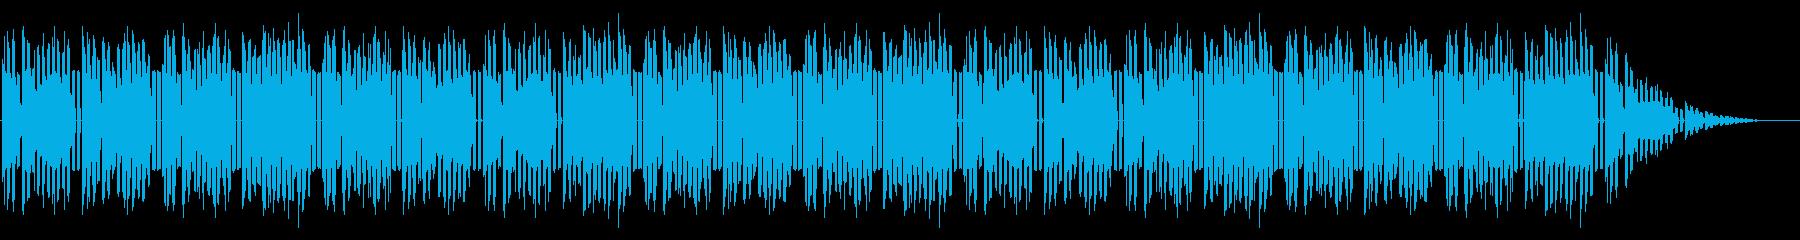 GB系風和風ゲームのゲームオーバーの再生済みの波形